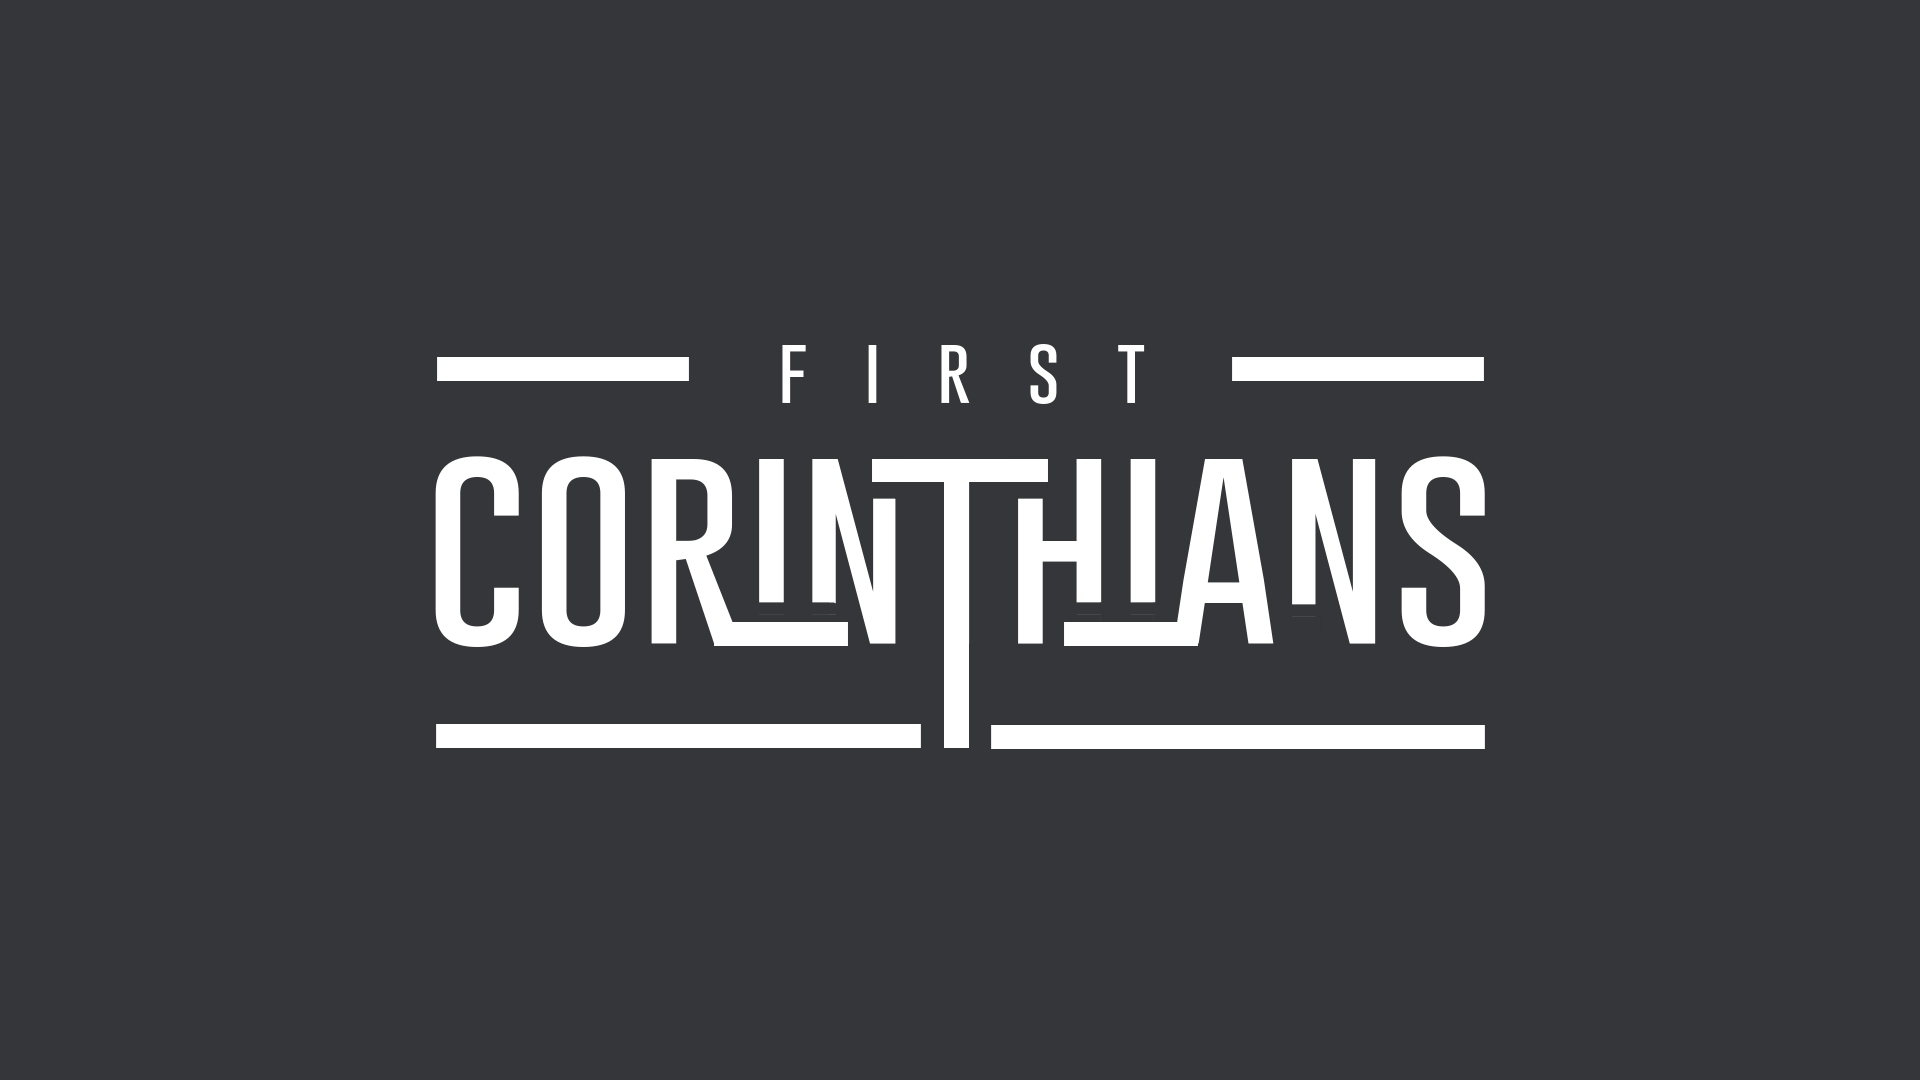 1corinthians-seriesimage.jpg